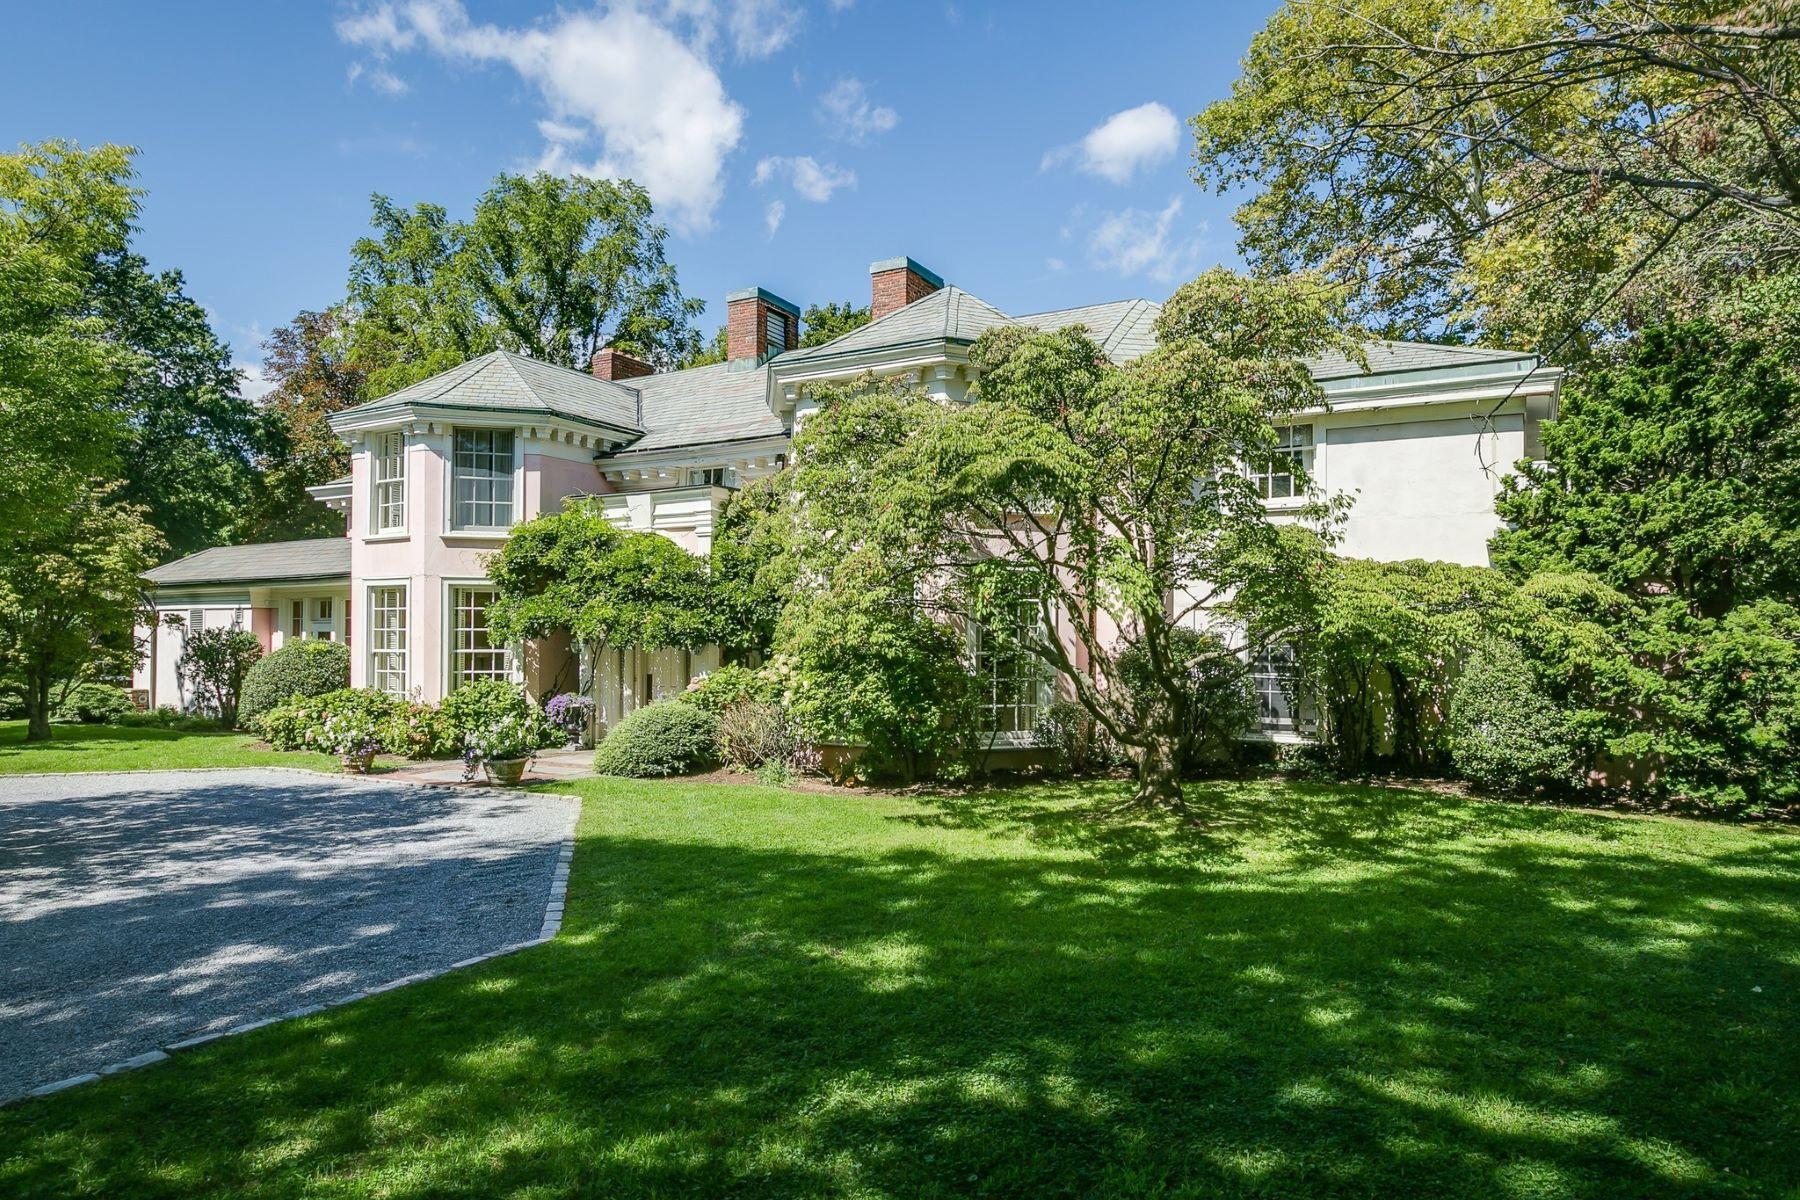 Single Family Homes for Sale at Glen Cove 1 Pond Rd Glen Cove, New York 11542 United States